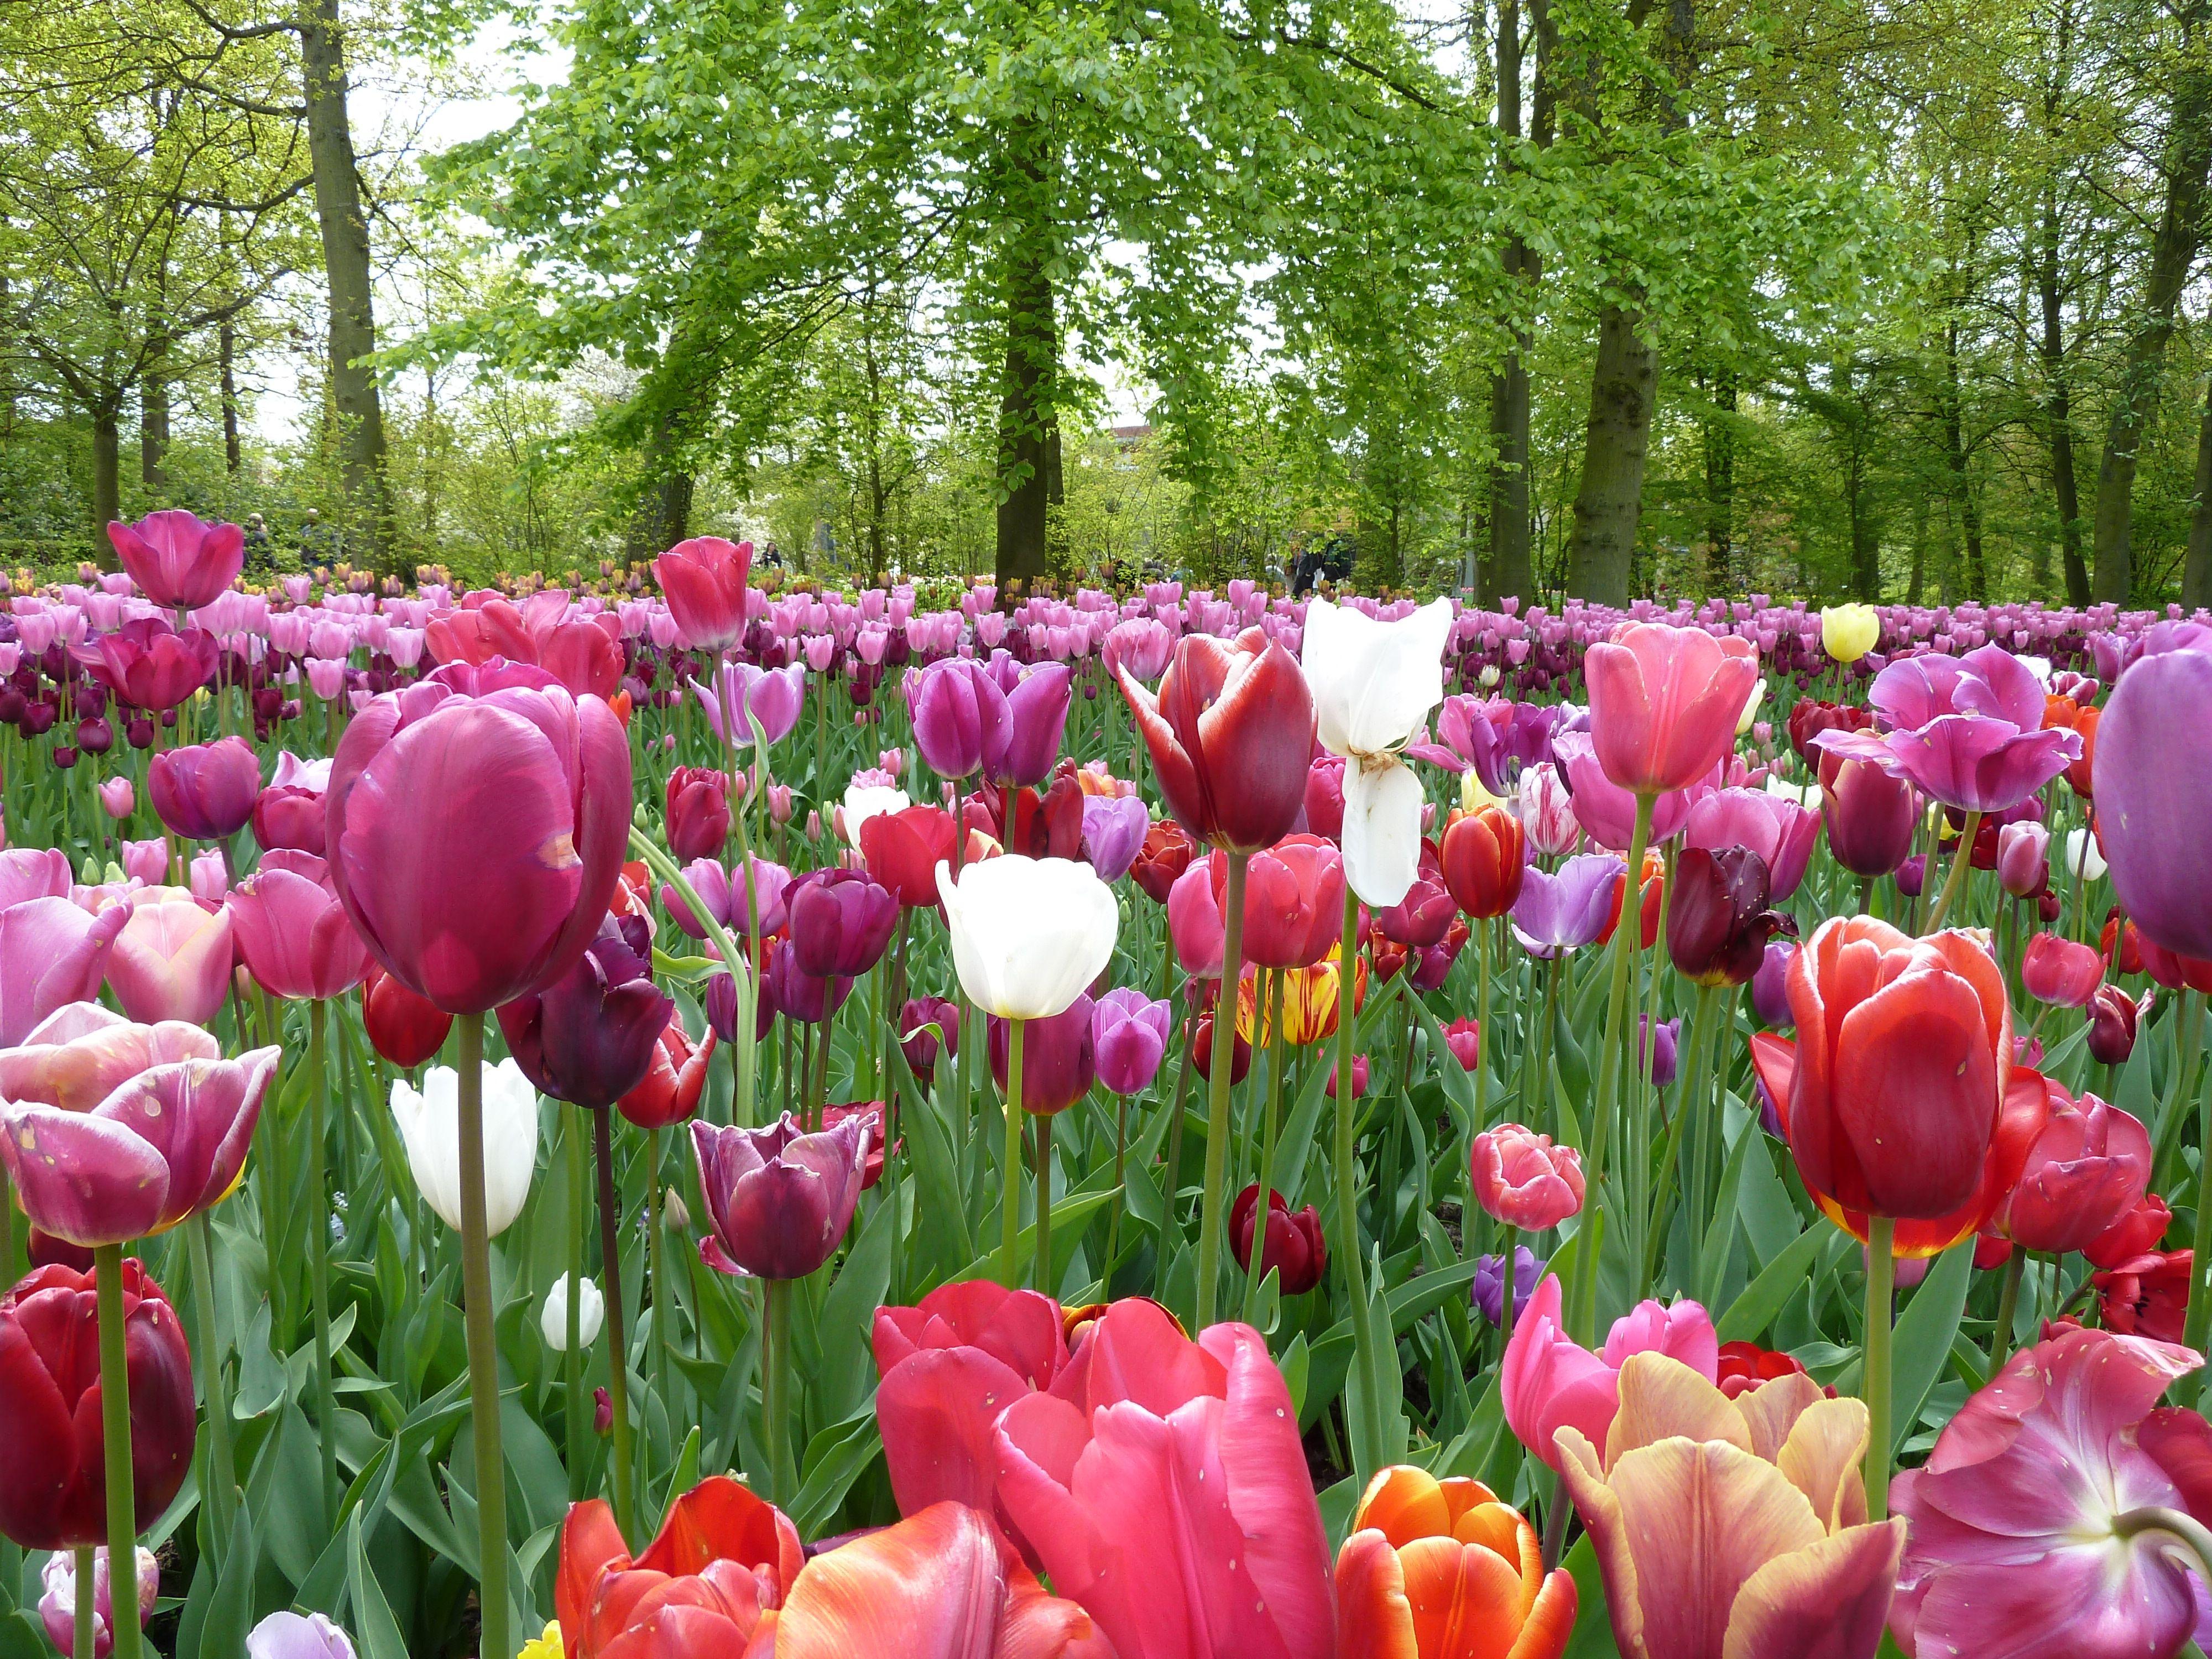 Pemandangan Taman Bunga Sakura Yang Indah Image By Pelautscom